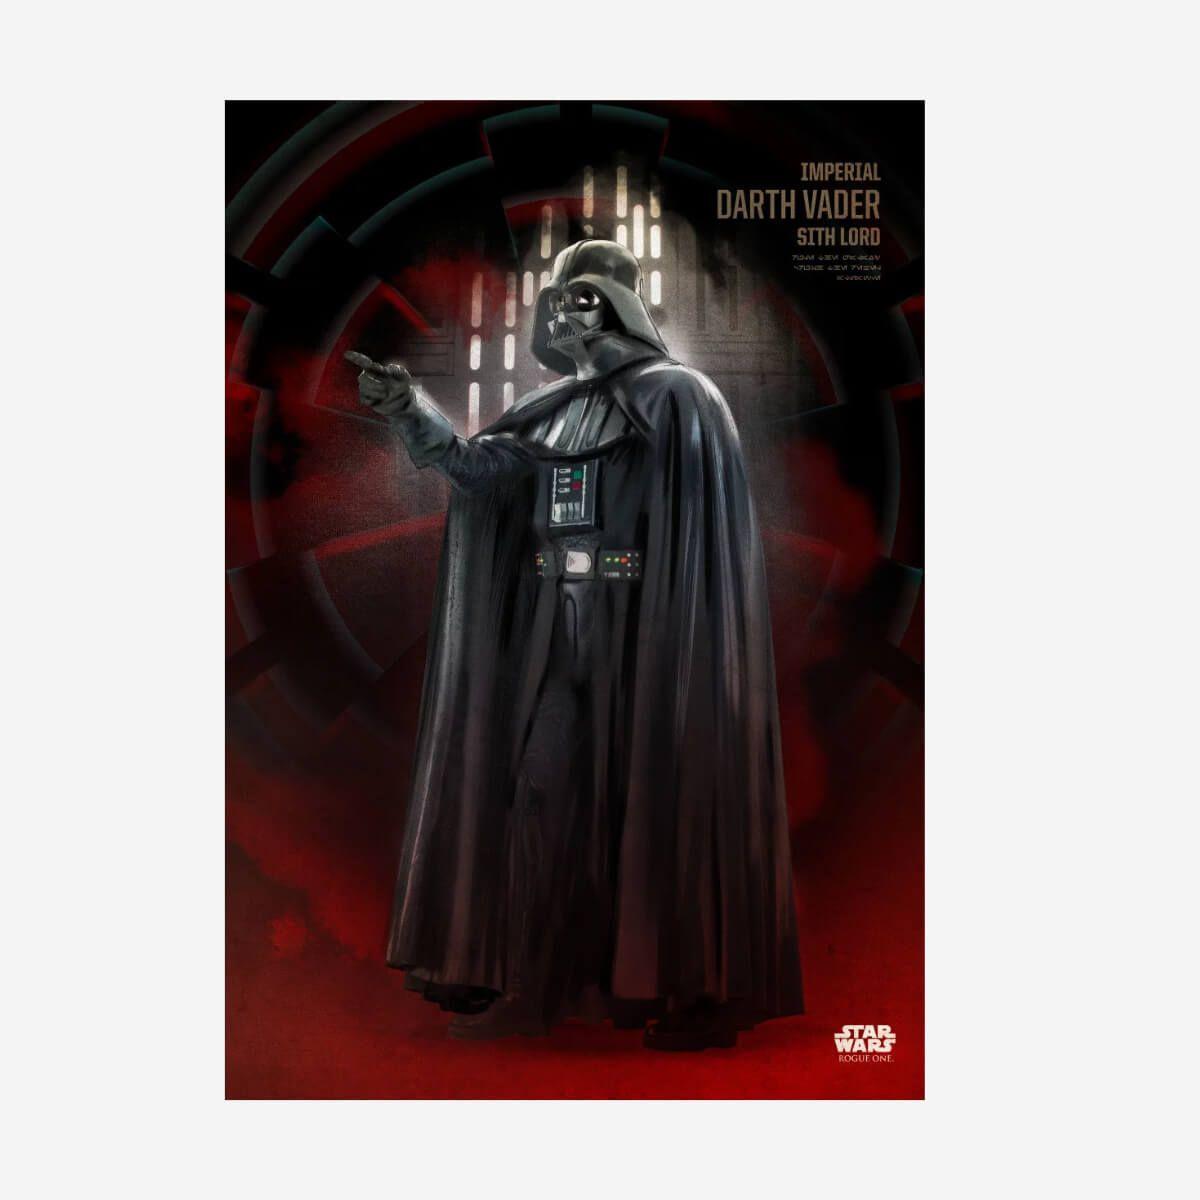 Darth Vader Rogue One Metall Poster Star Wars